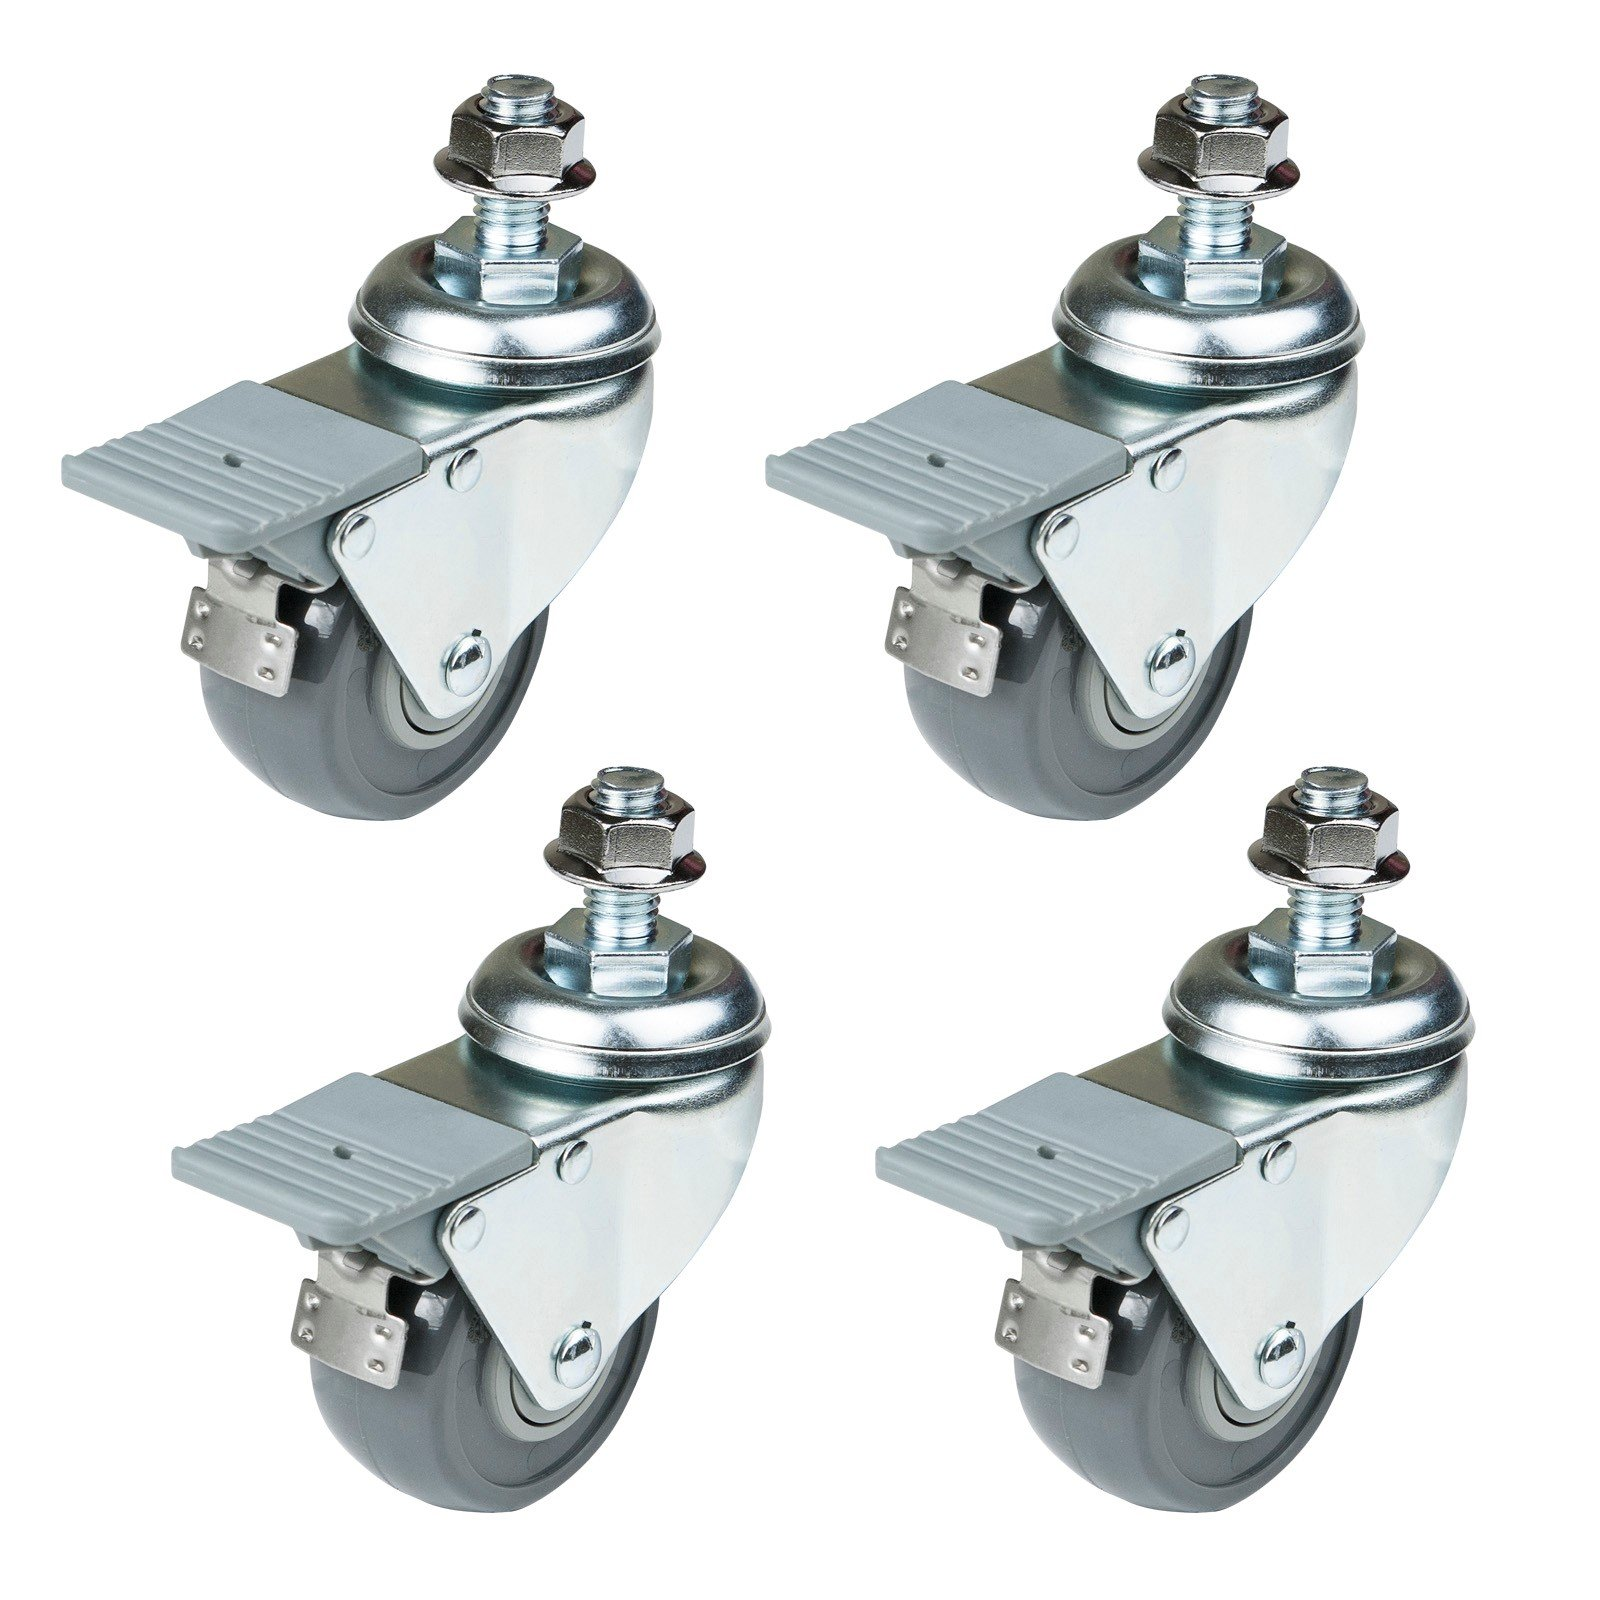 POWERTEC 17202 Dual-Locking Swivel Caster Set, 4-Pack 4, 2-3/8-Inch